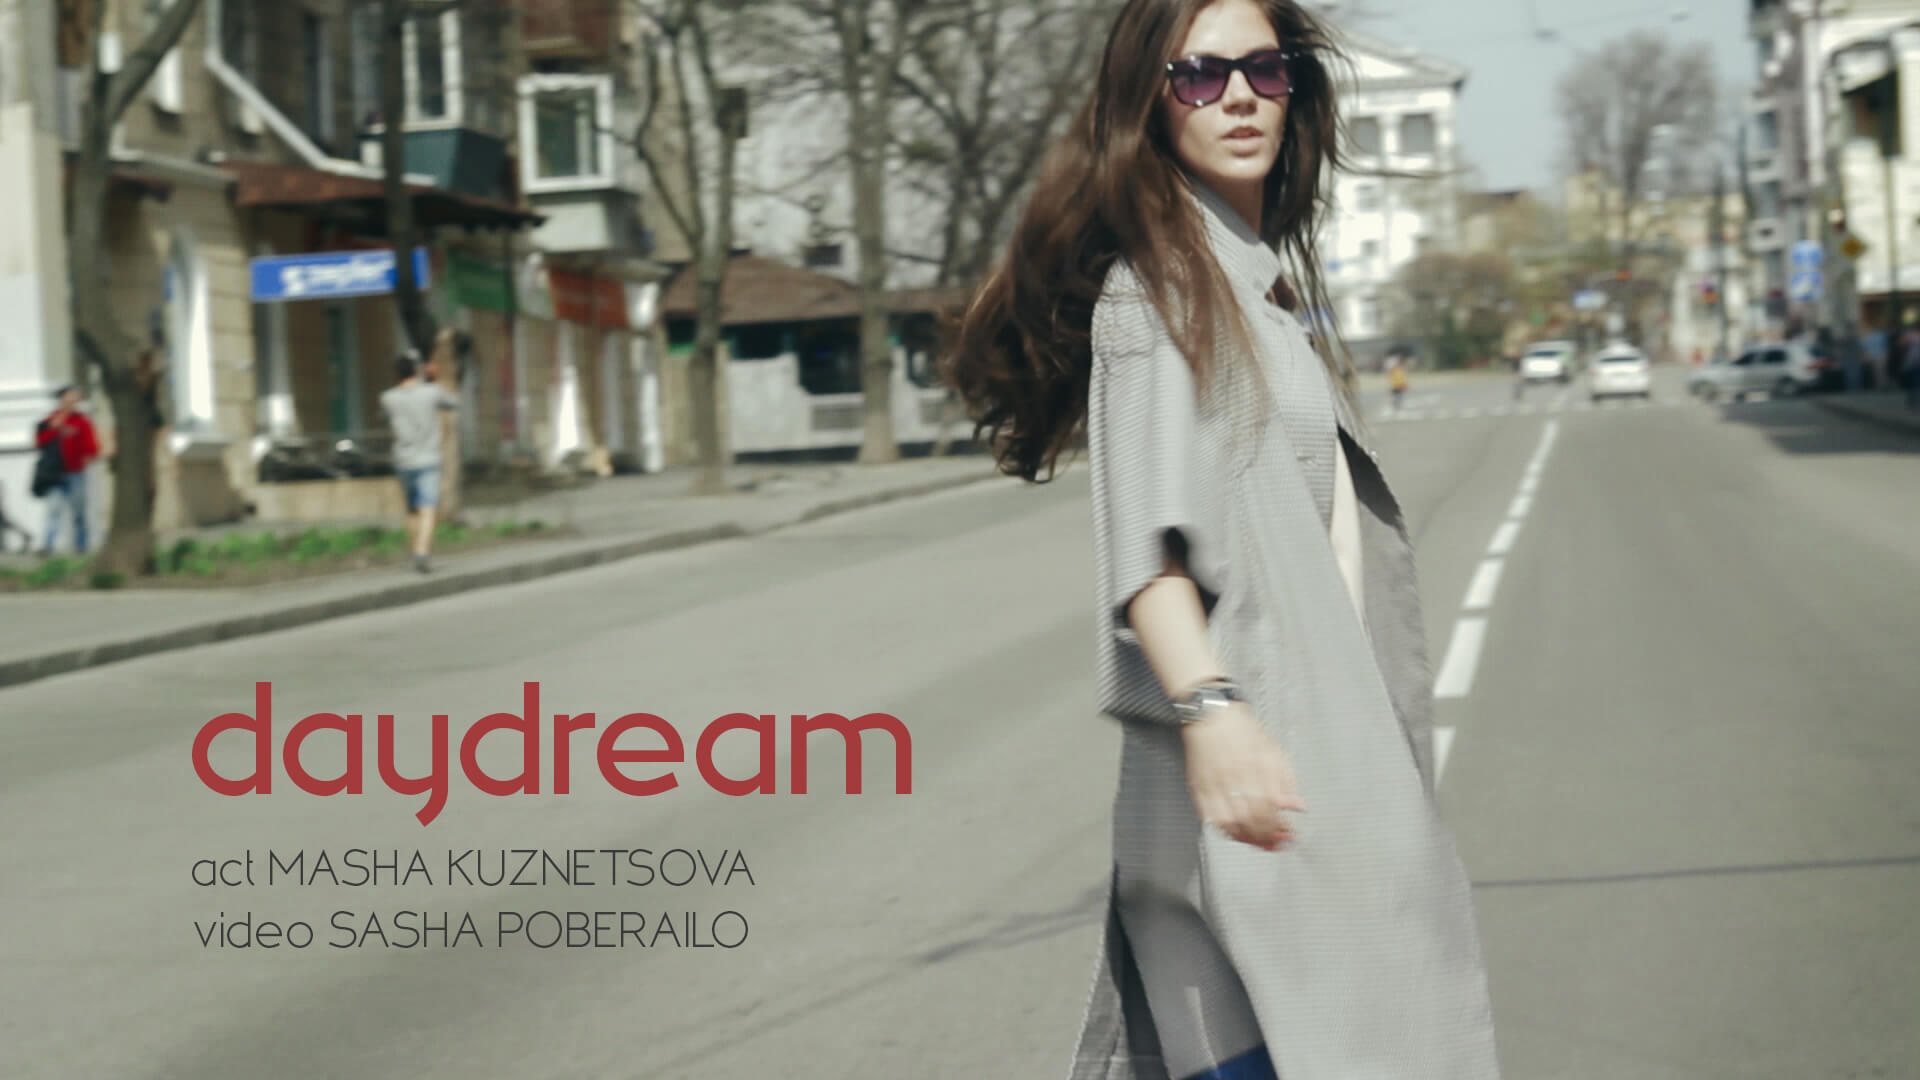 daydream fashion short film - Eleonora